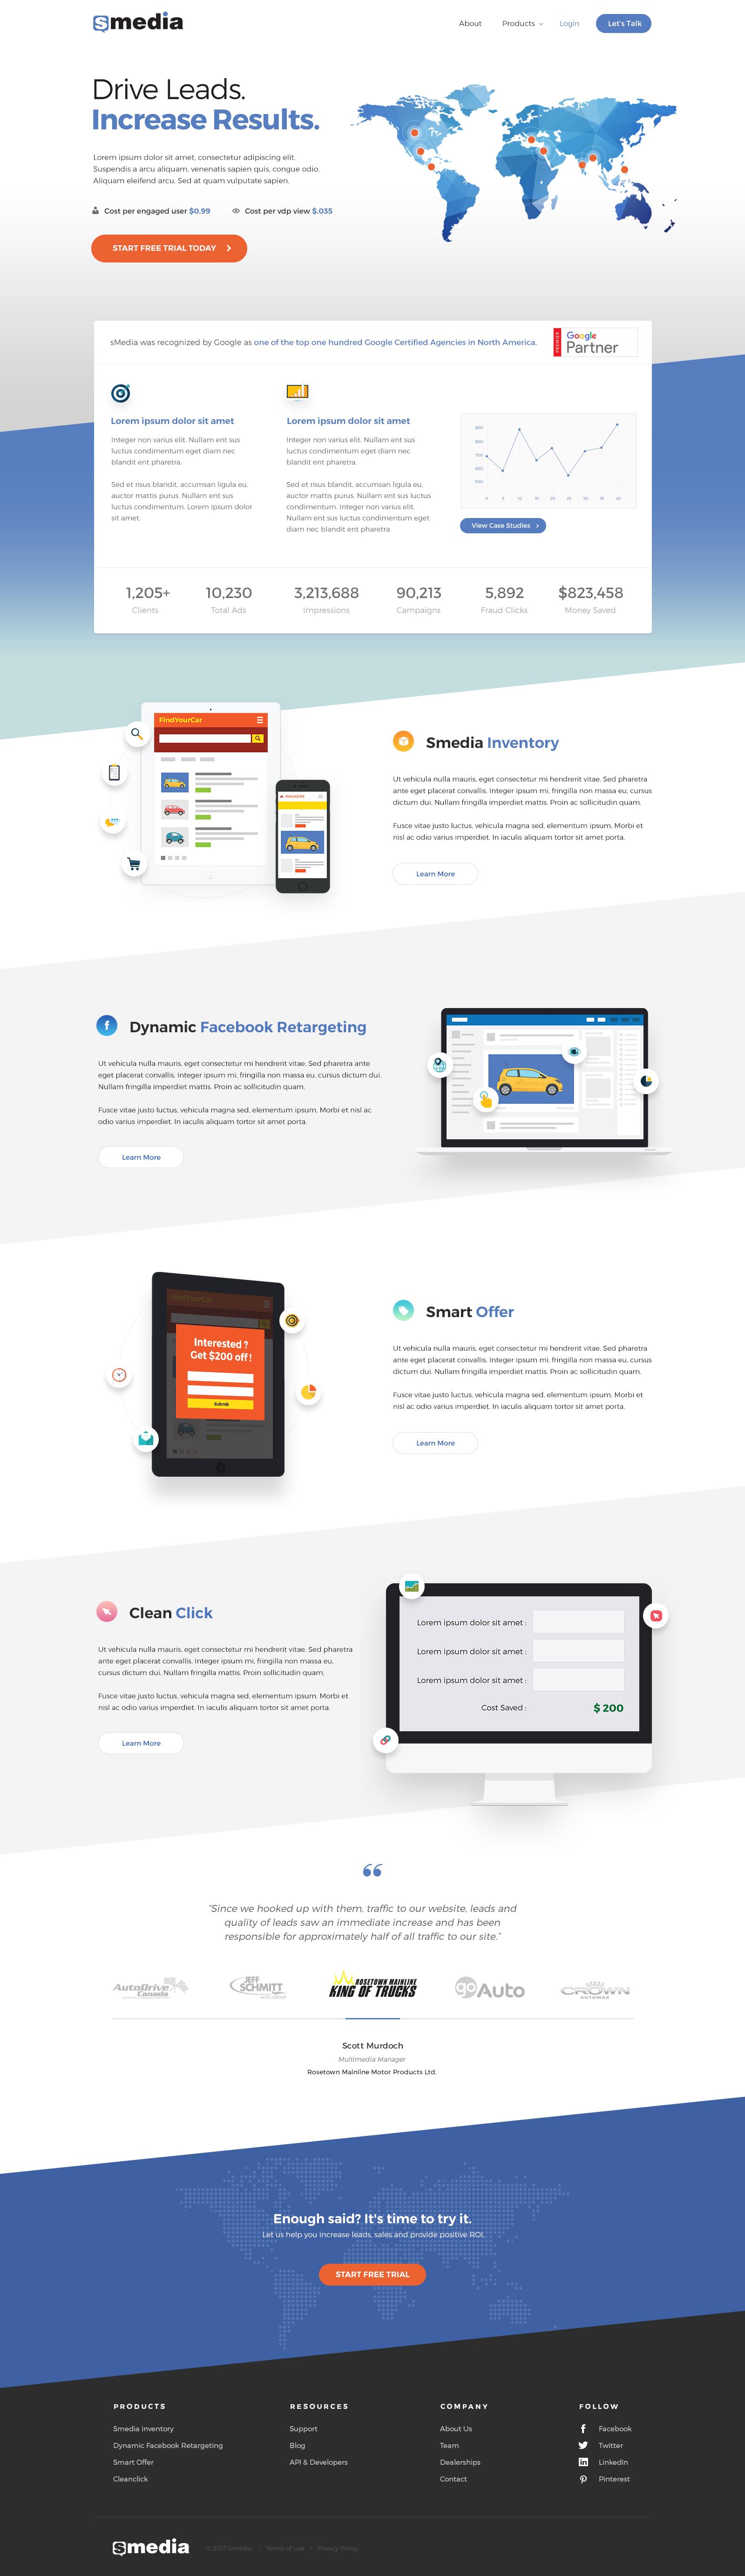 Designs National Digital Tech Company Web Page Design Contest Page Design Web Design Contest Design